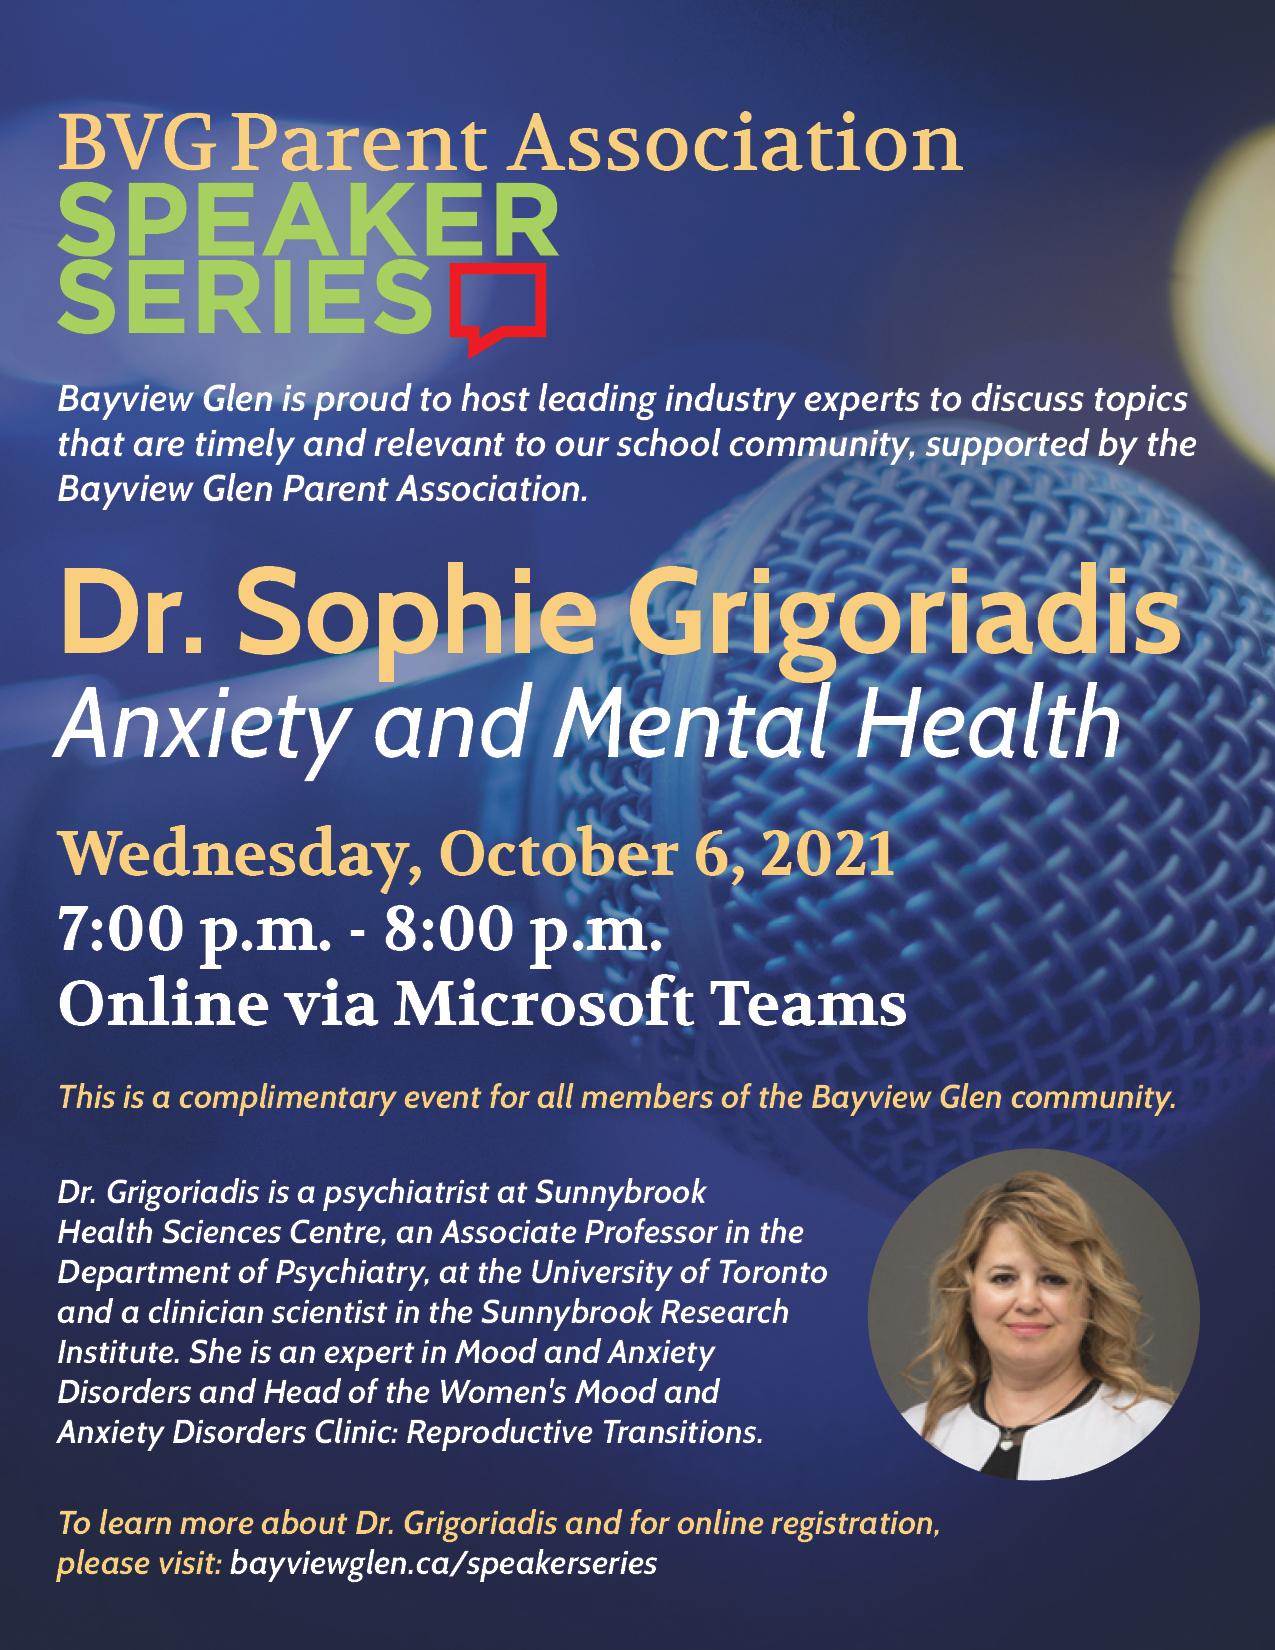 BVG Speaker Series Dr. Sophie Grigoriadis Poster